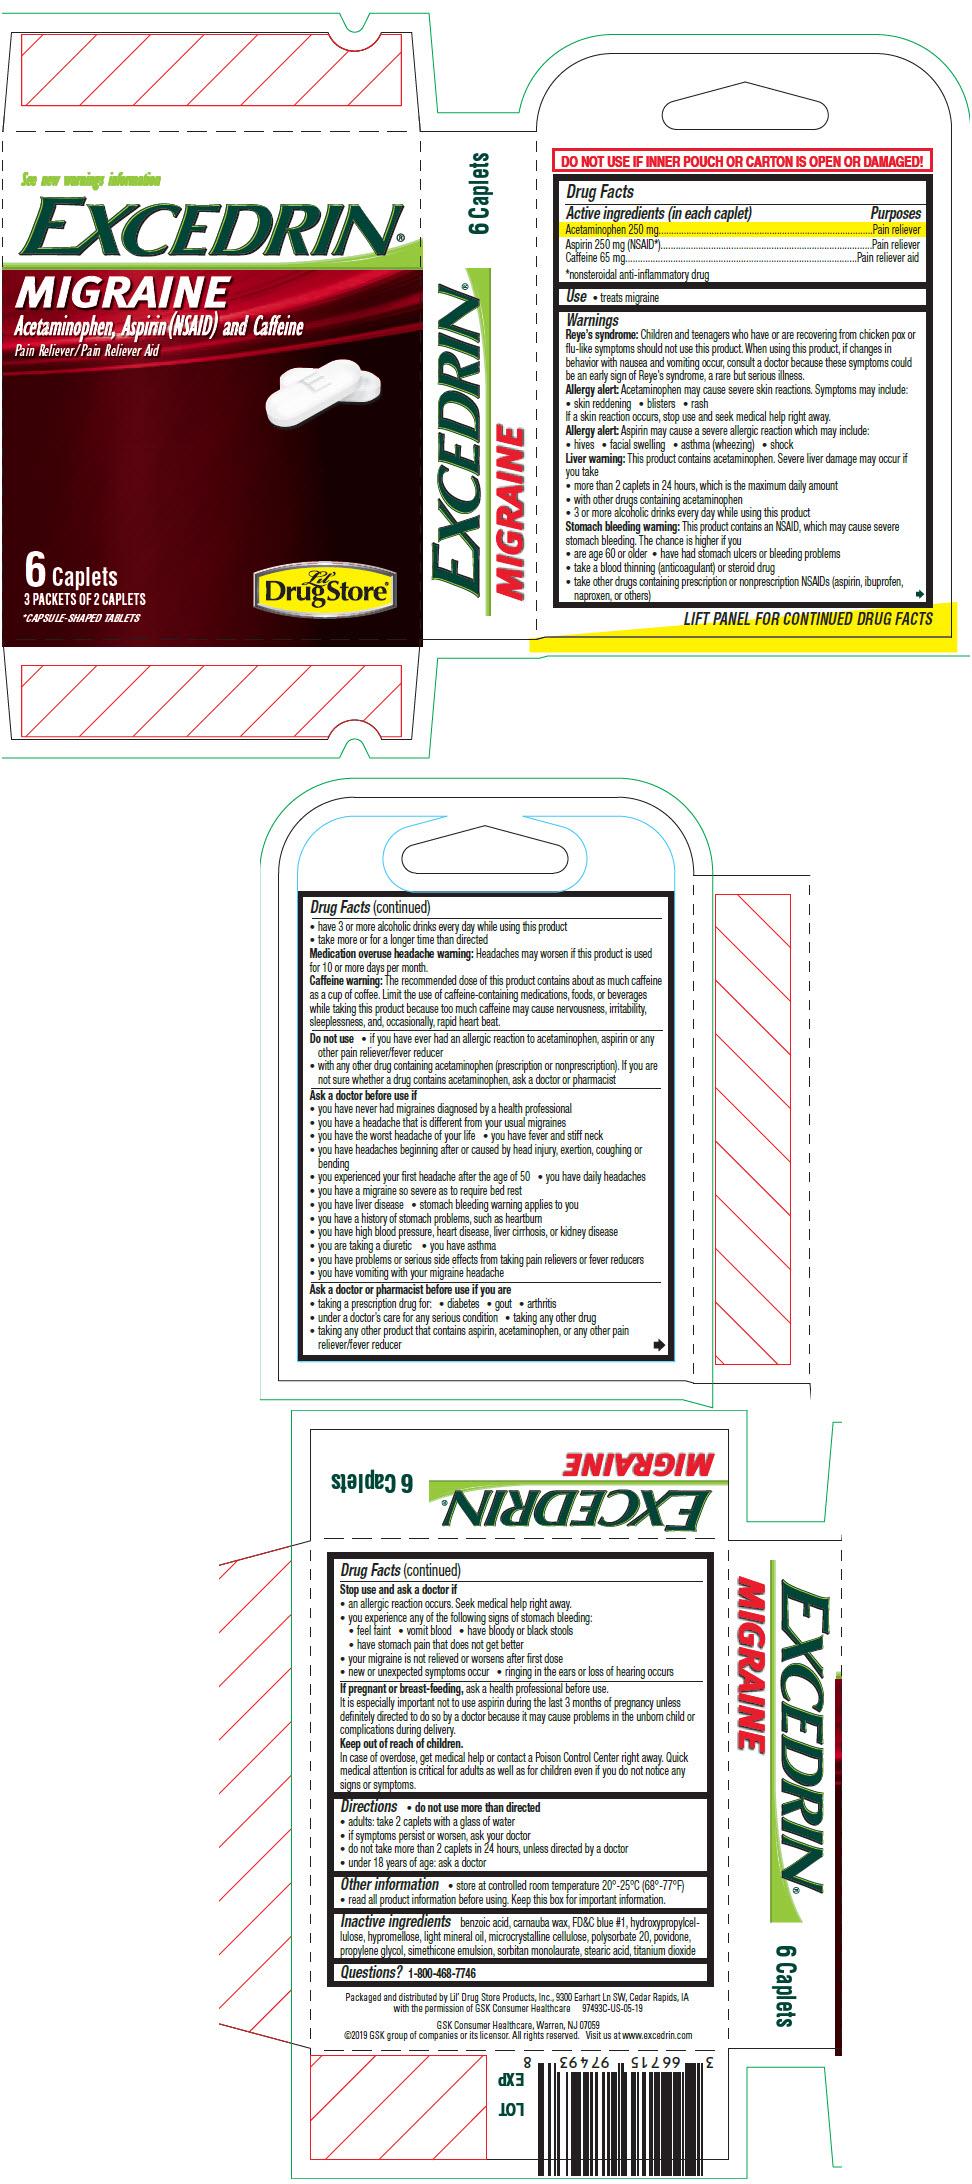 PRINCIPAL DISPLAY PANEL - 6 Caplet Packet Carton